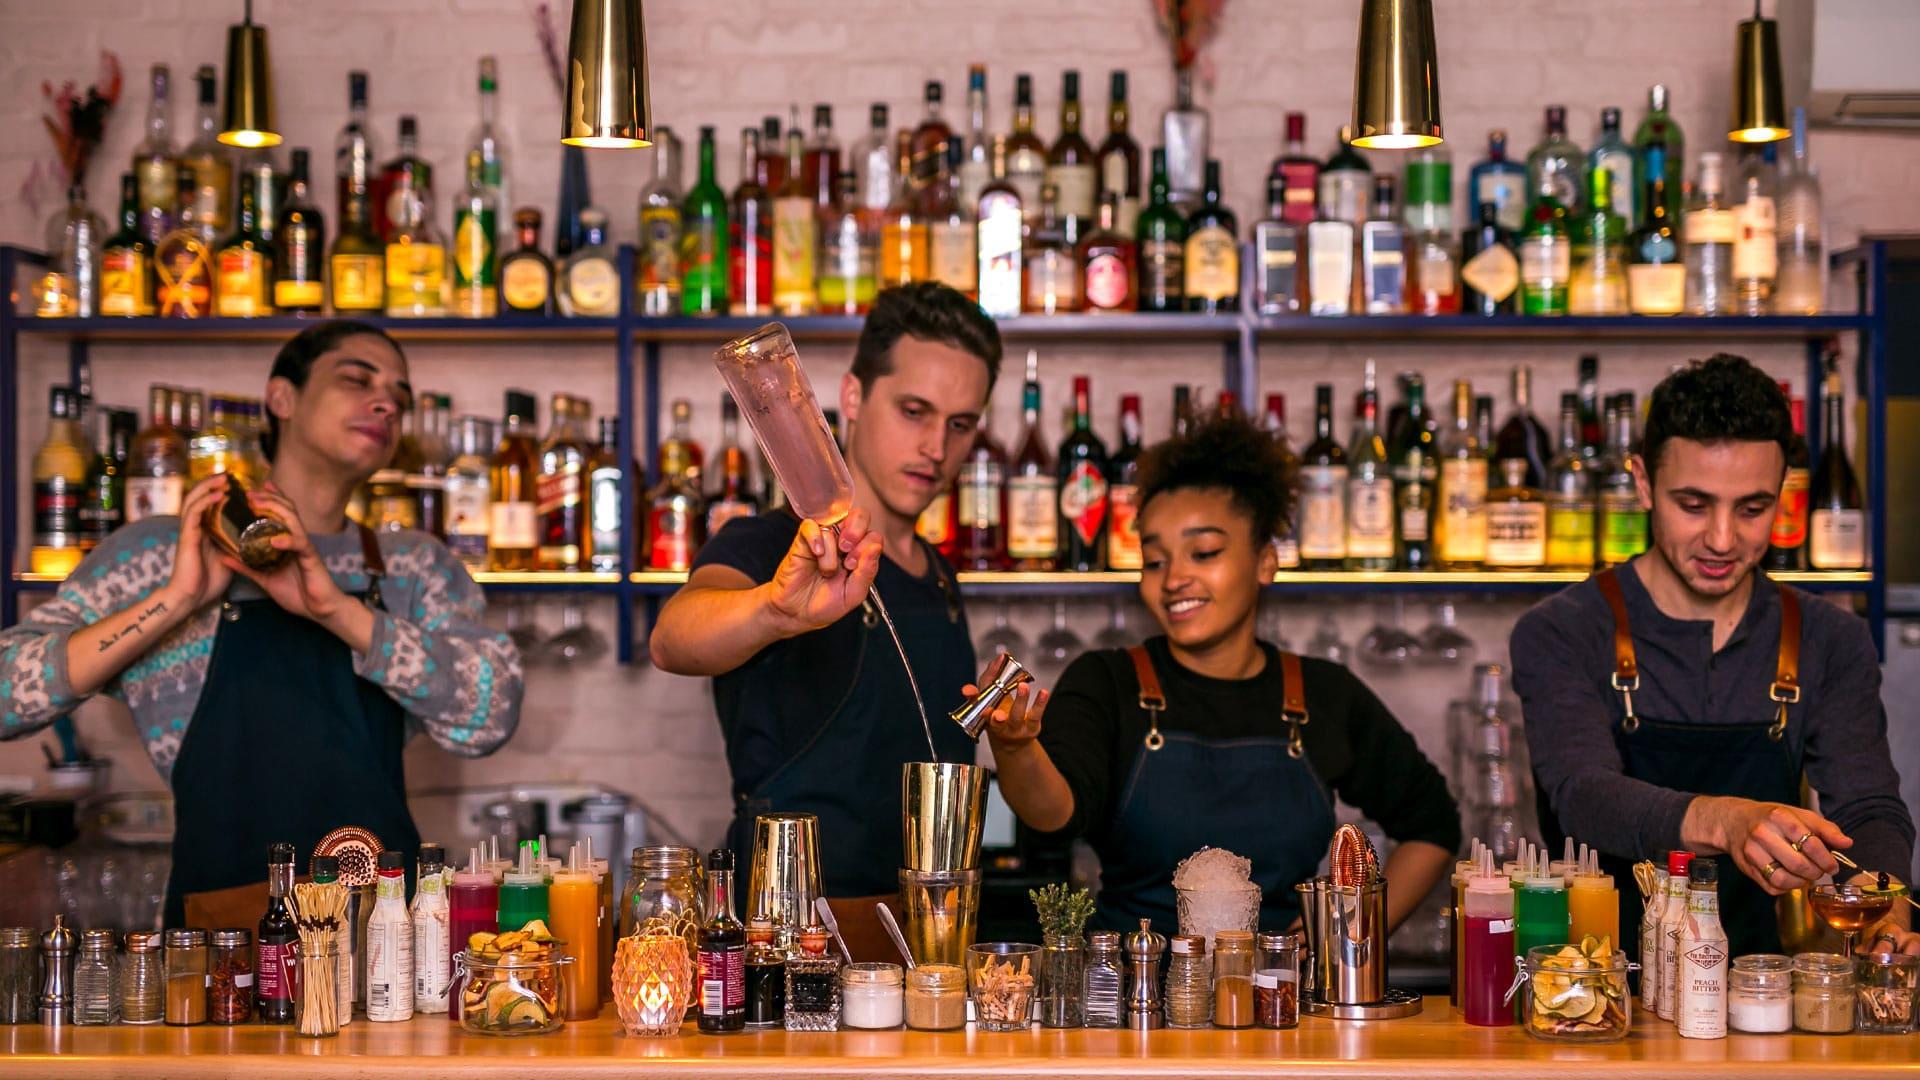 loutre bar paris cocktails haig club